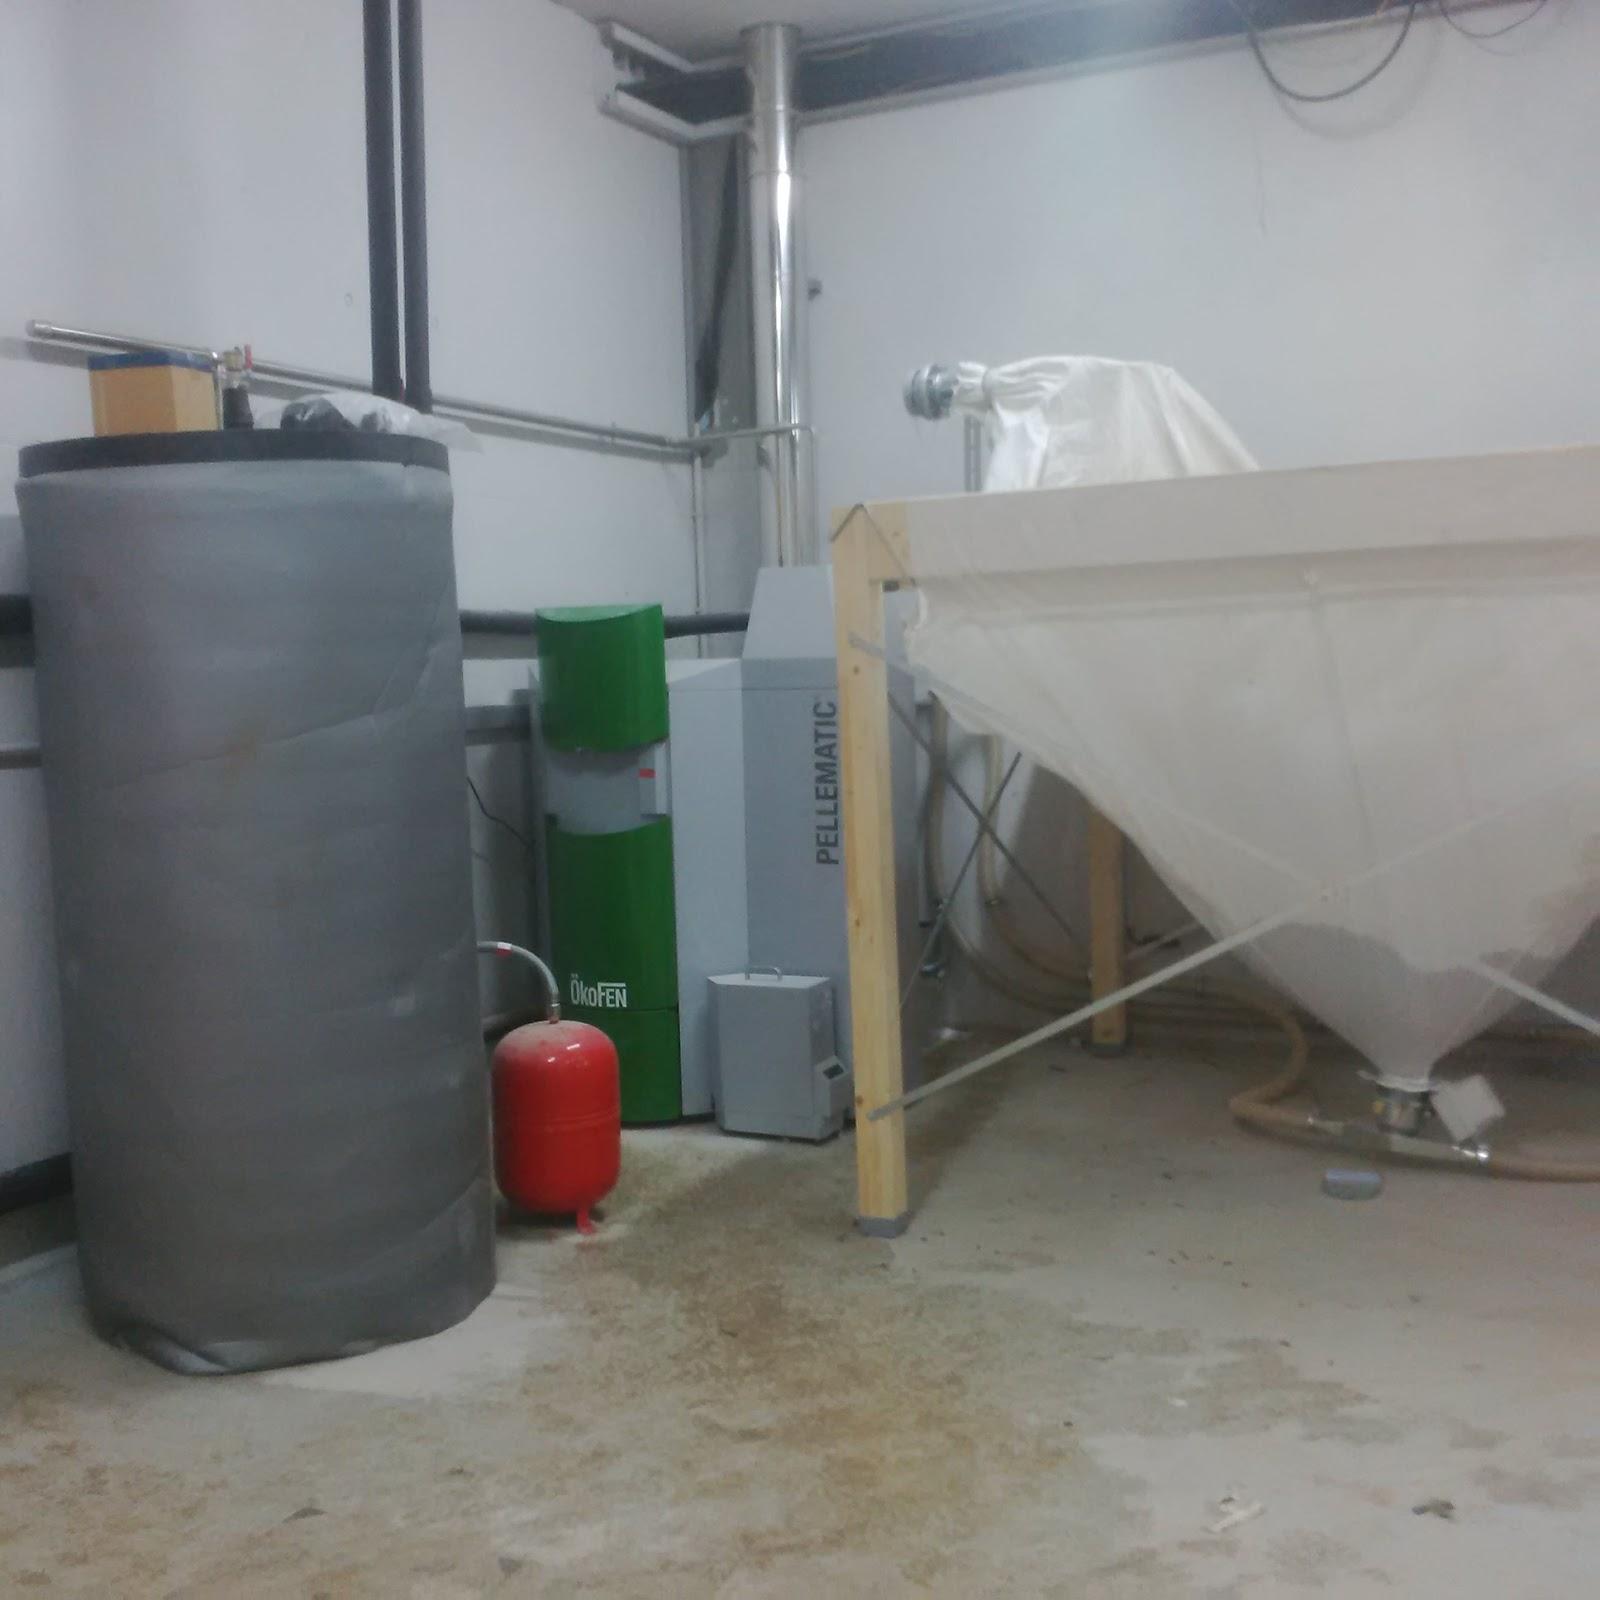 Calderas de biomasa seguimos prefiriendo biomasa - Calderas para suelo radiante ...